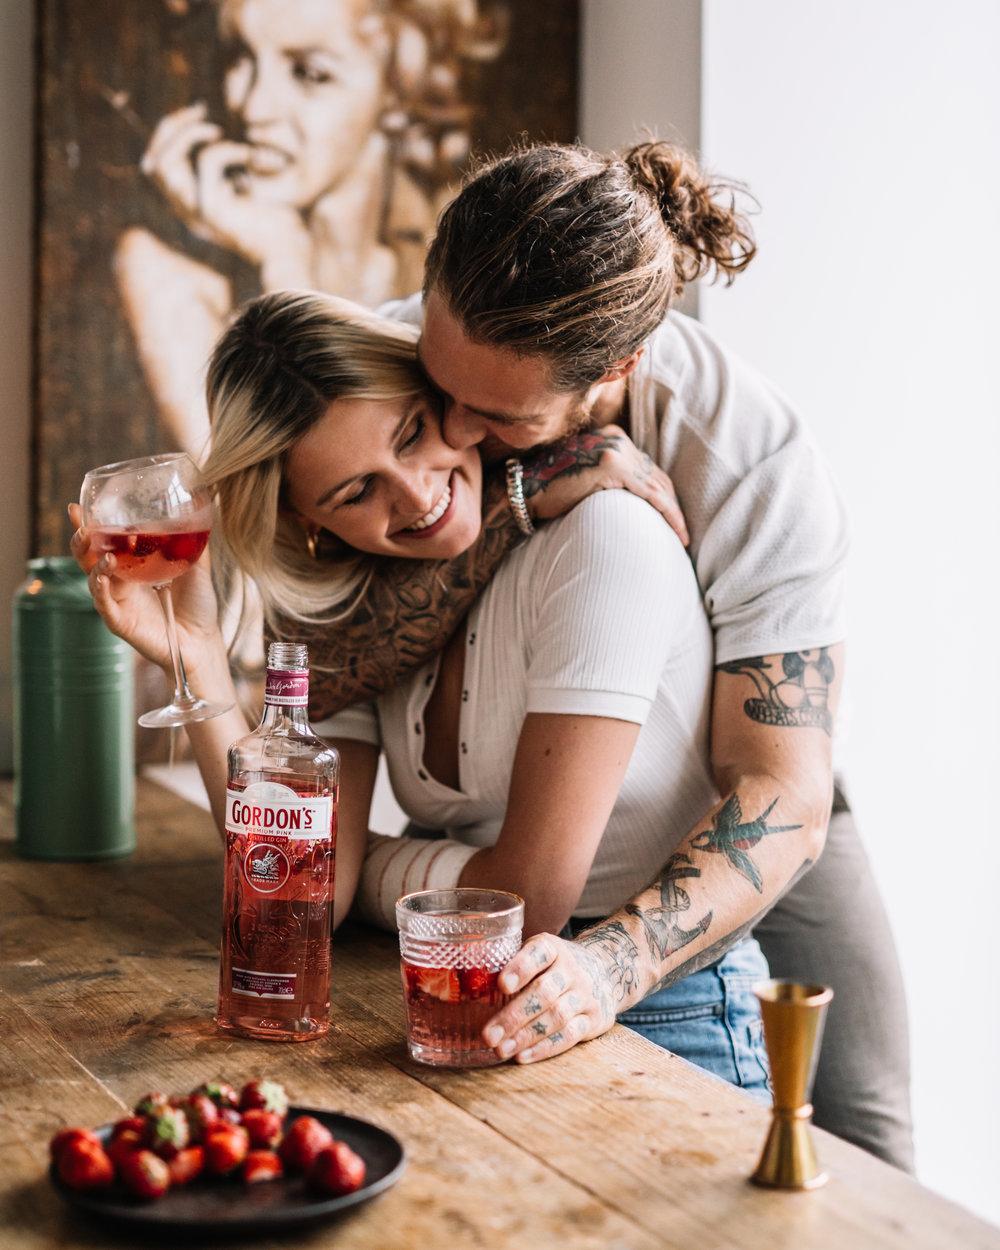 #Letscocktail Gordons Pink Gin 20189.jpg